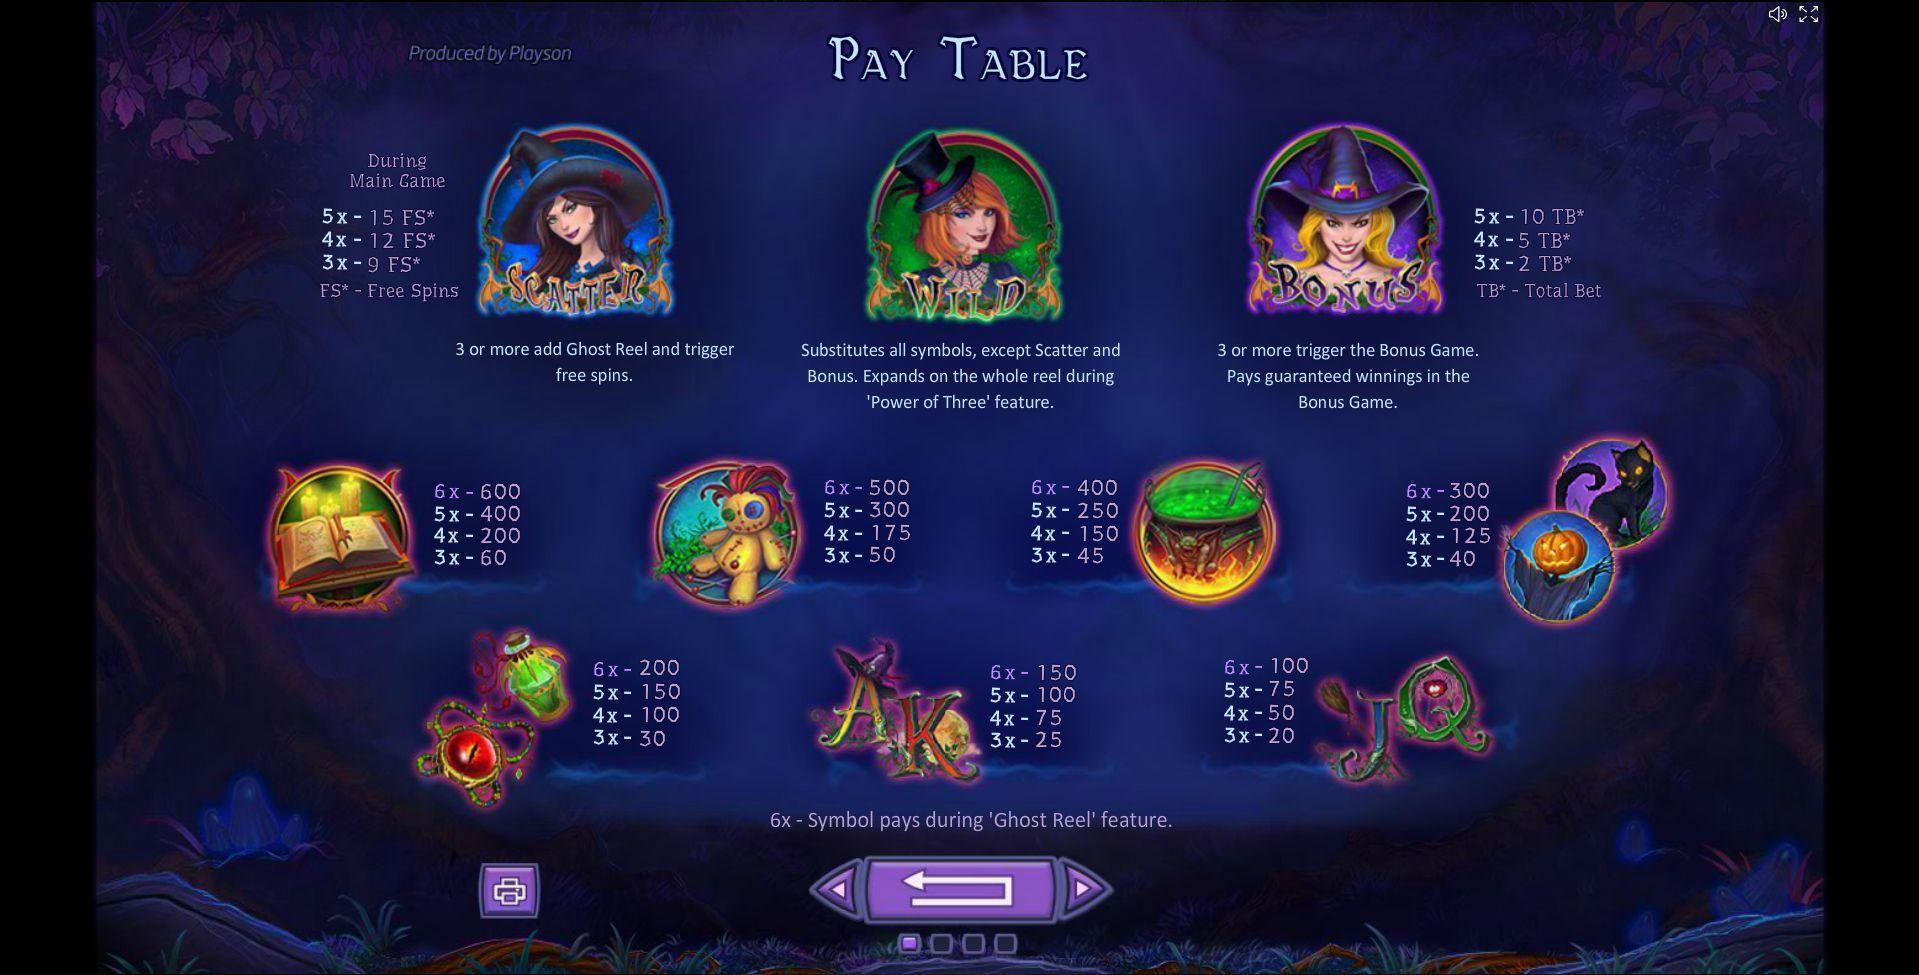 SpellCraft Slot Paytable